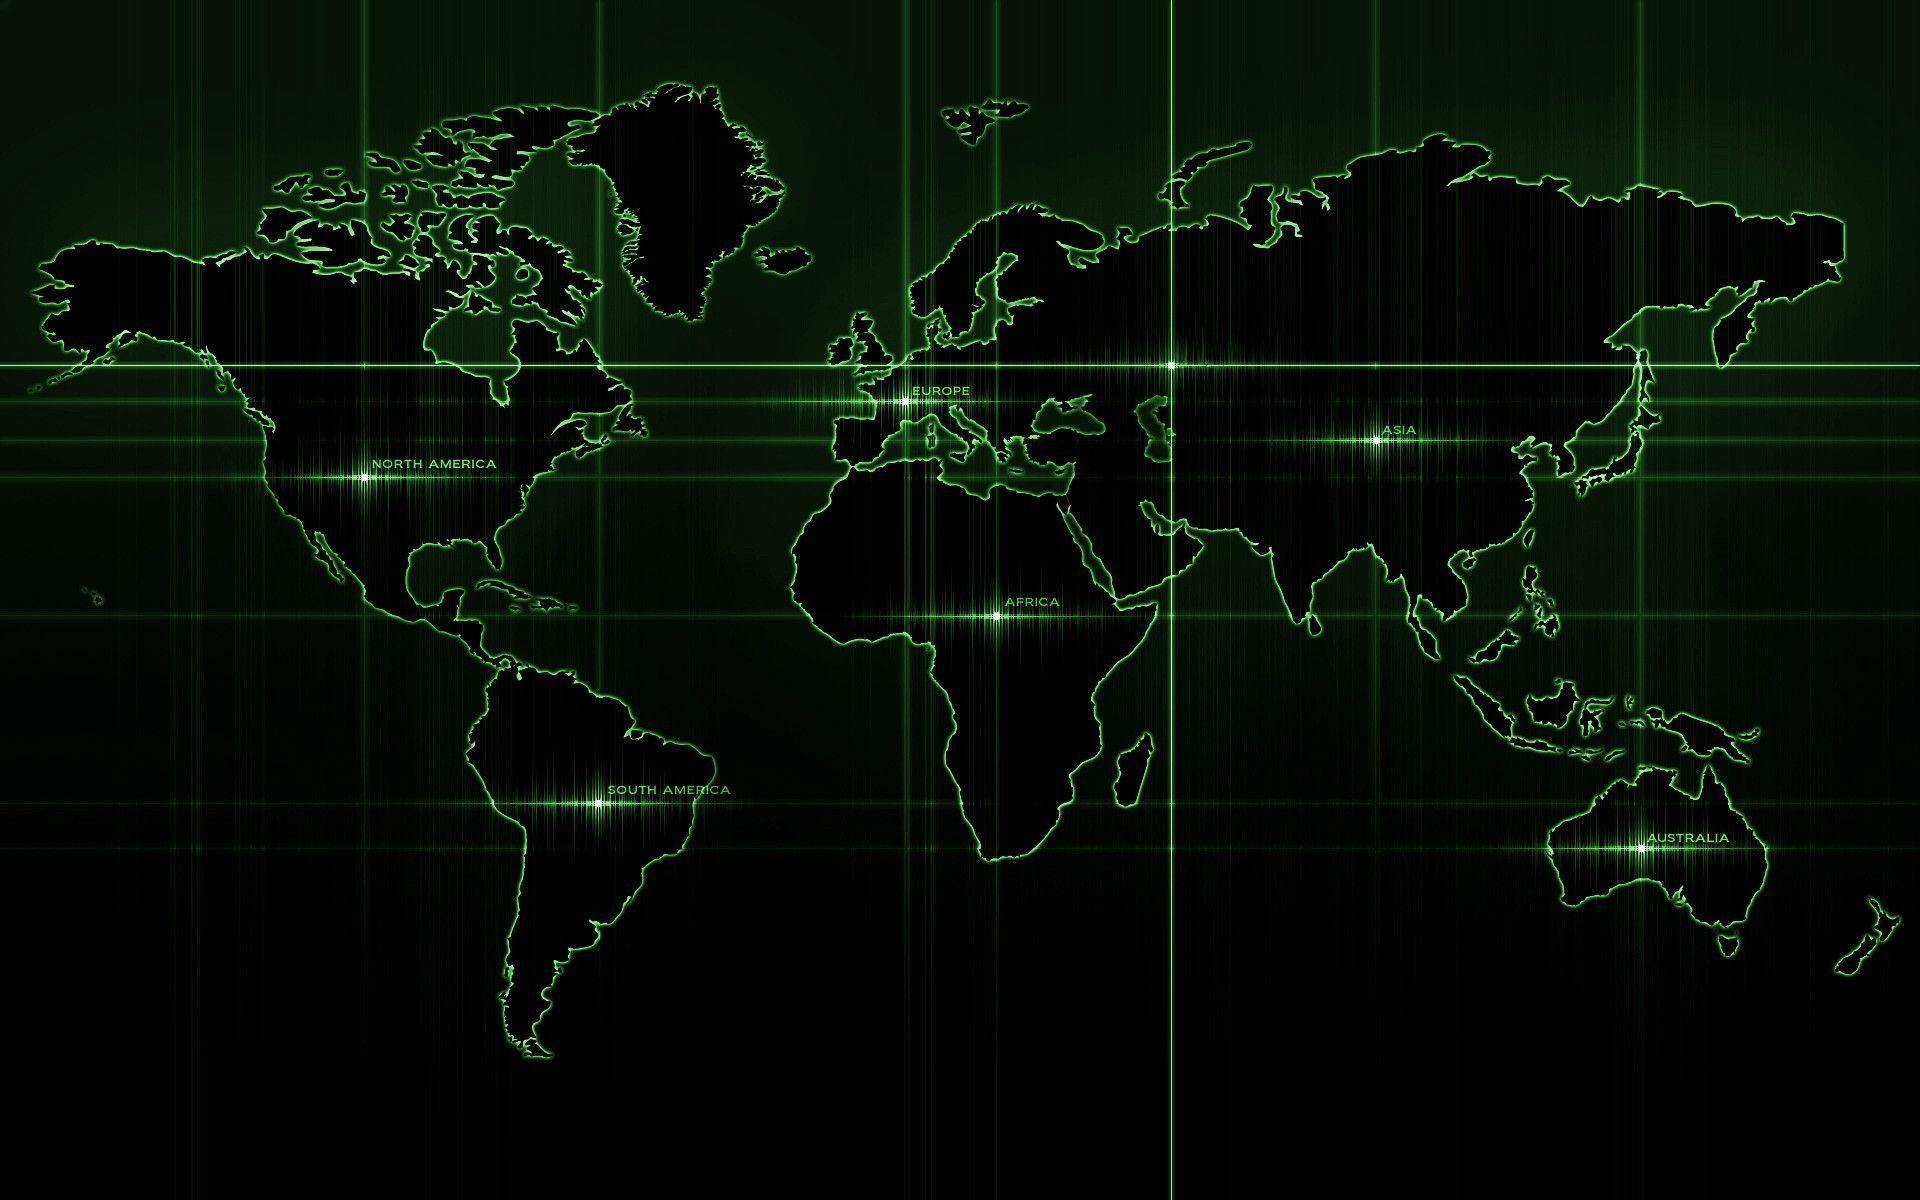 World Map Wallpapers Wallpaper Cave - World map wallpaper south africa